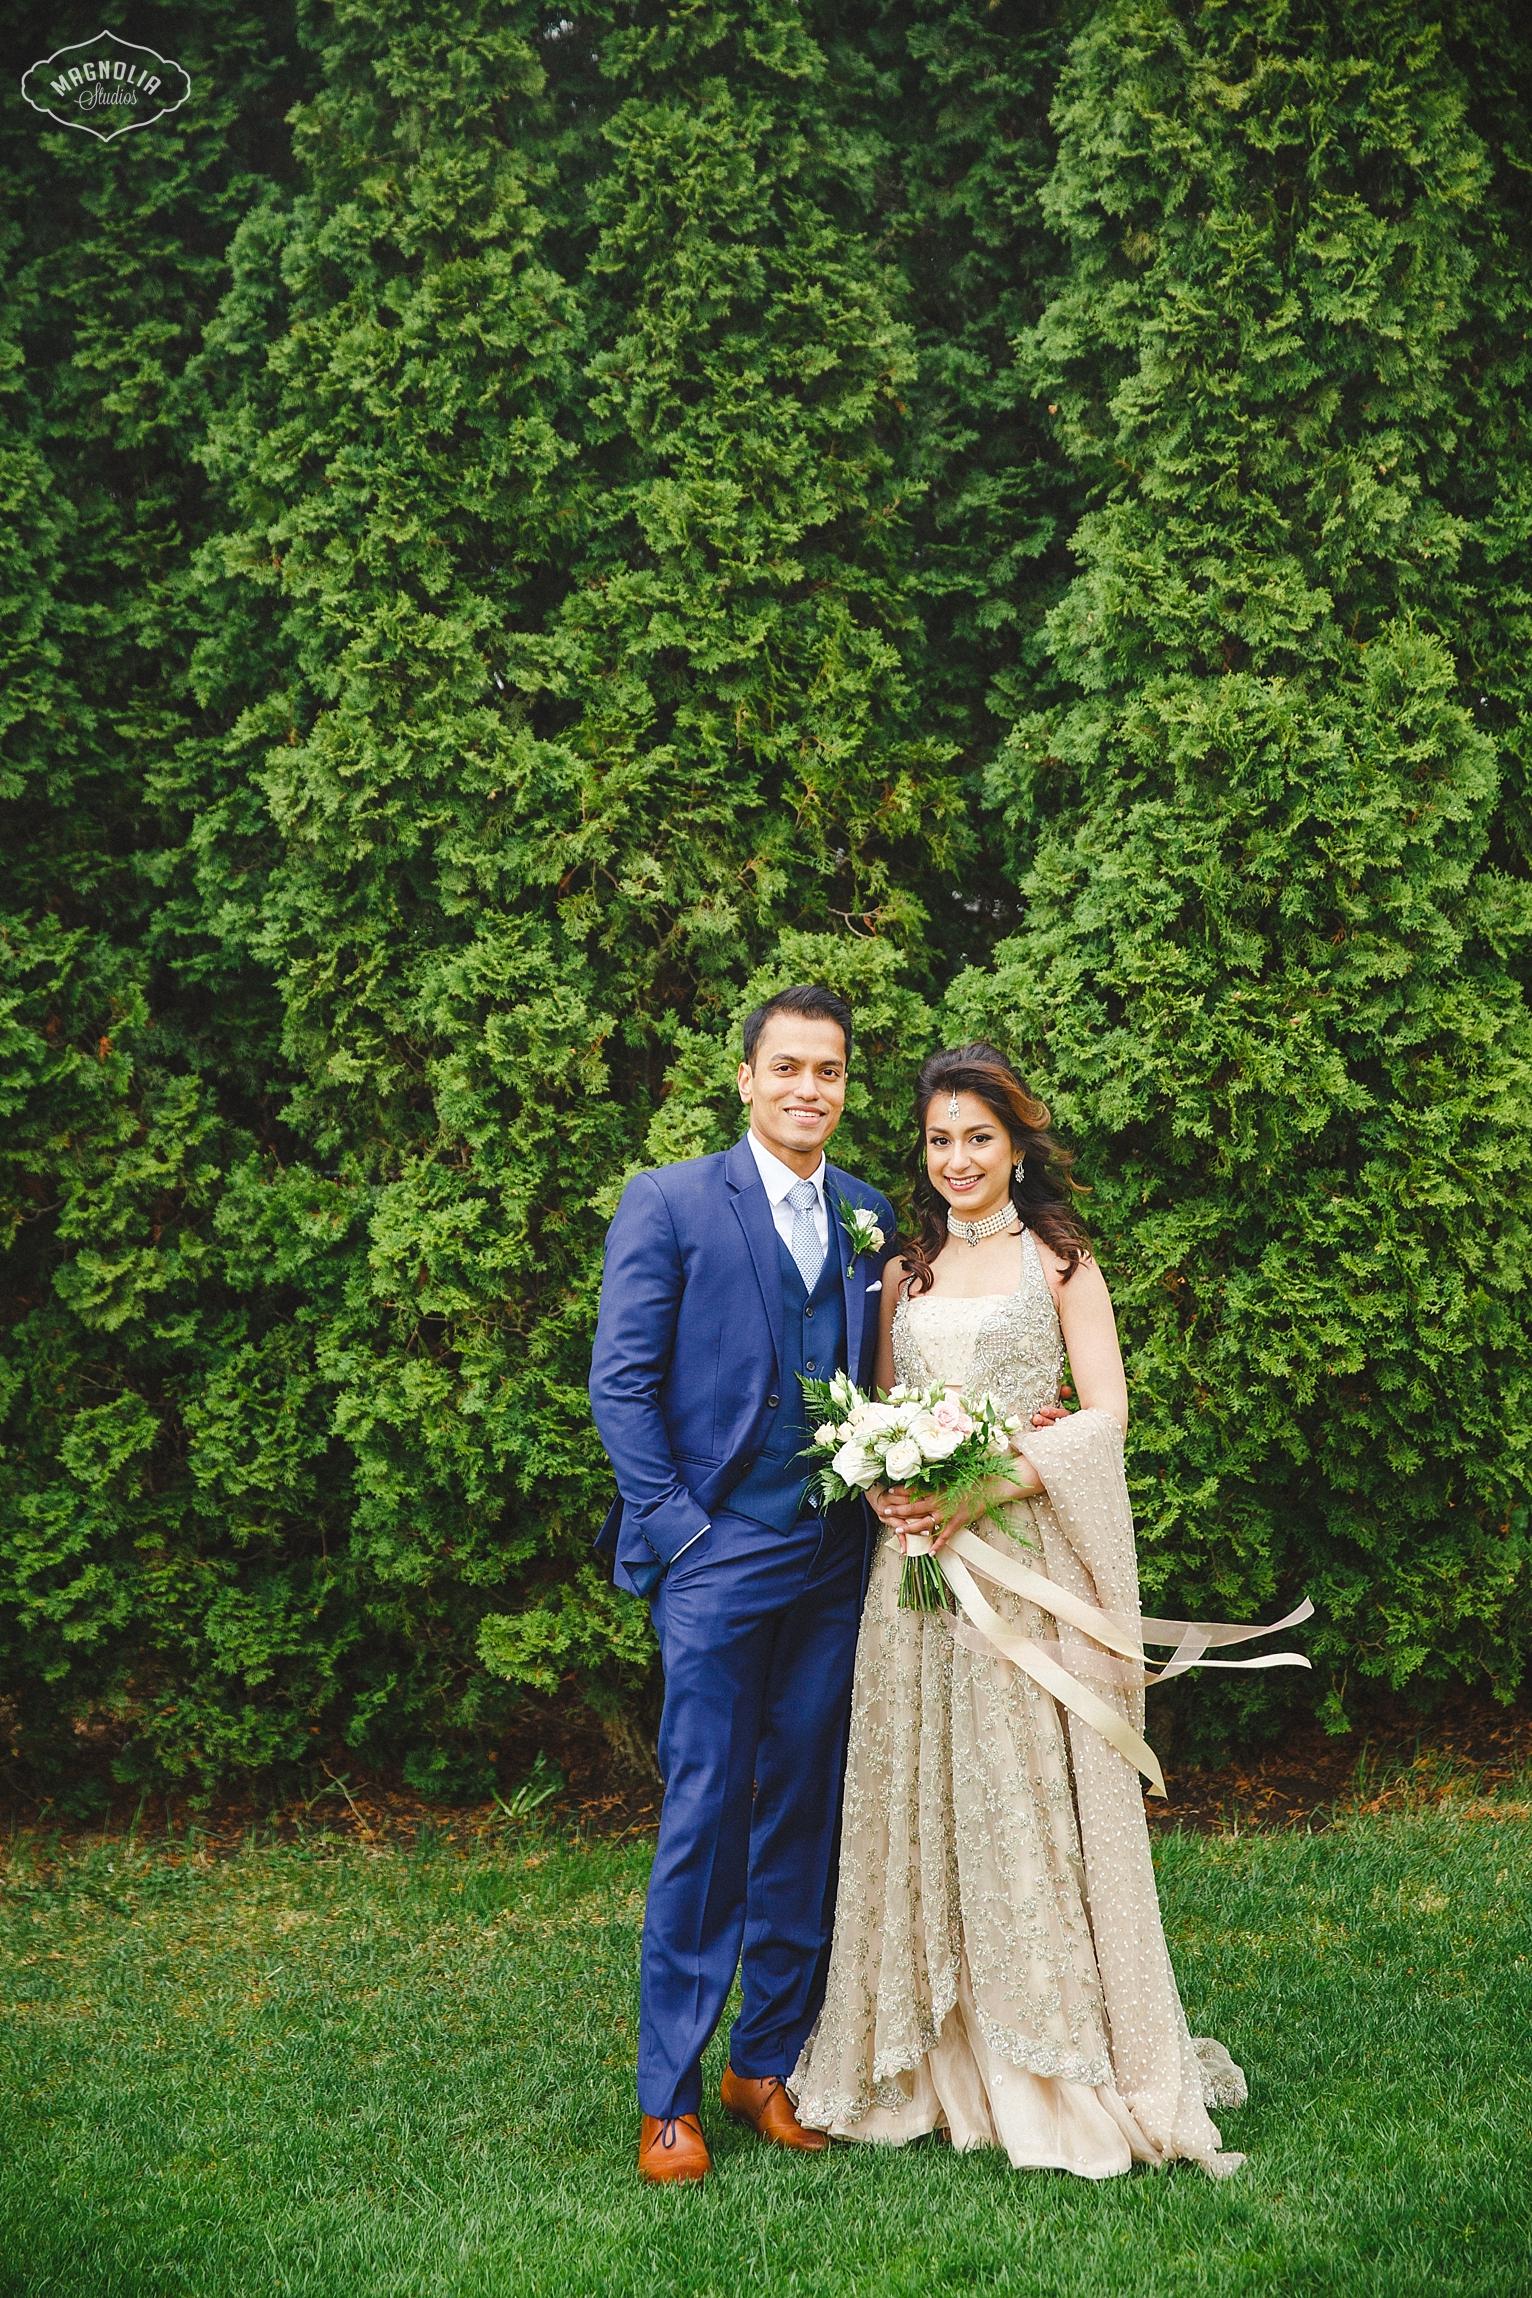 The Manor wedding photography